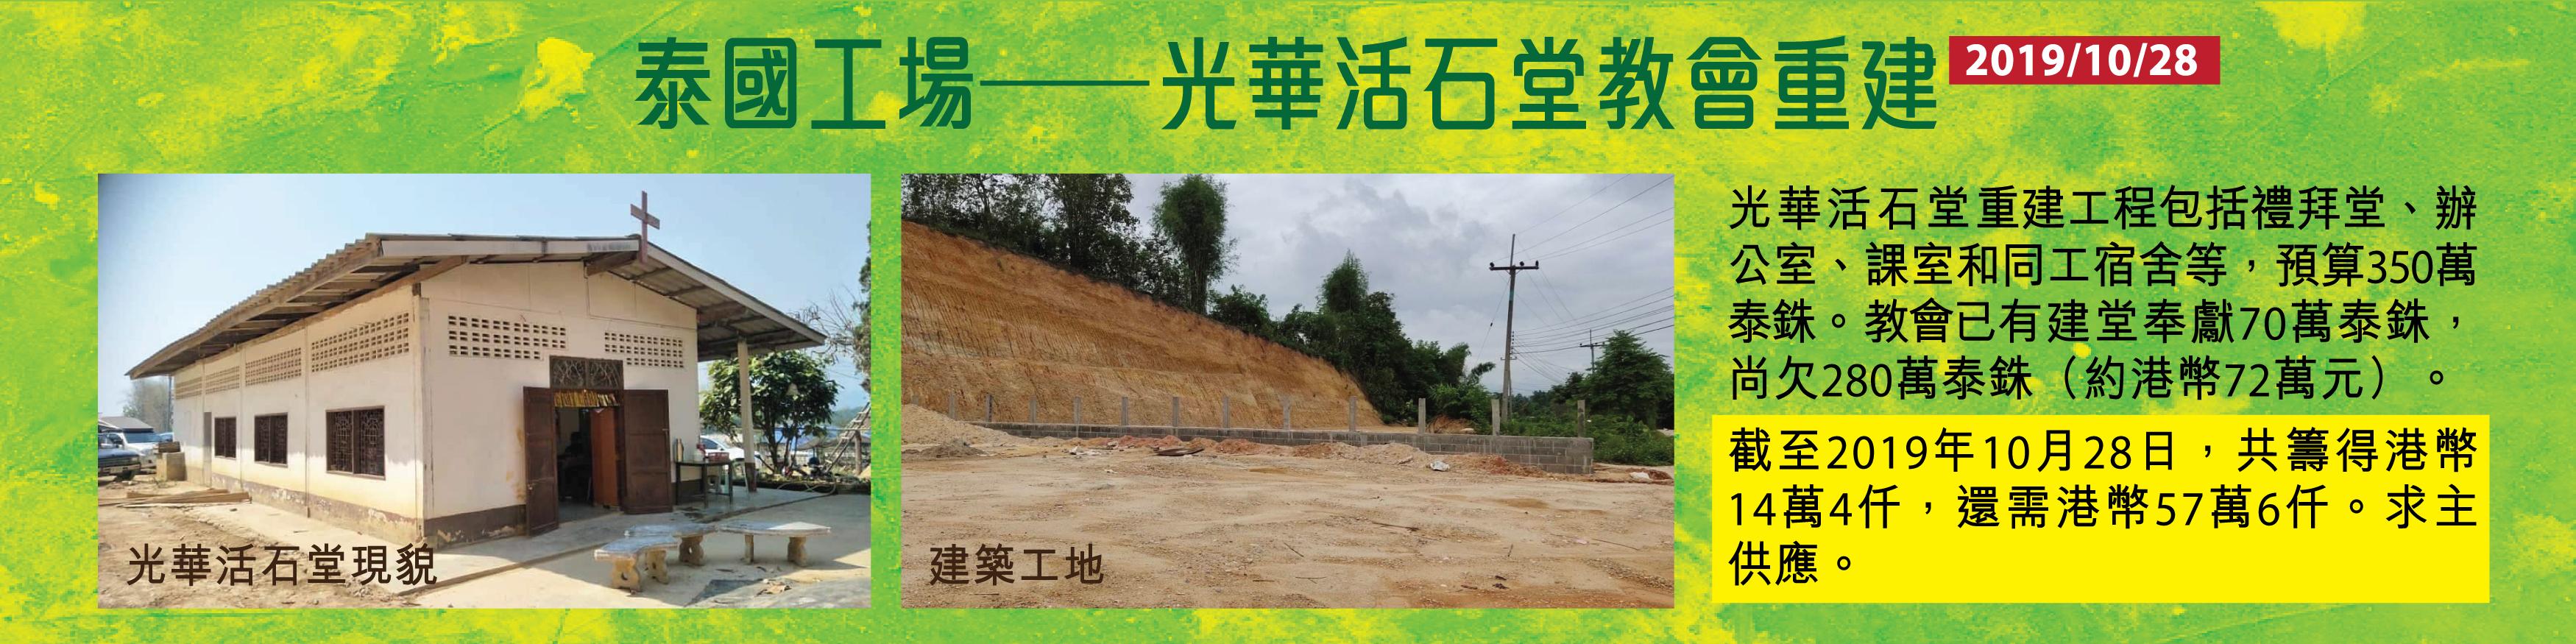 CB-02-web-banner-1680-x-420-03-6